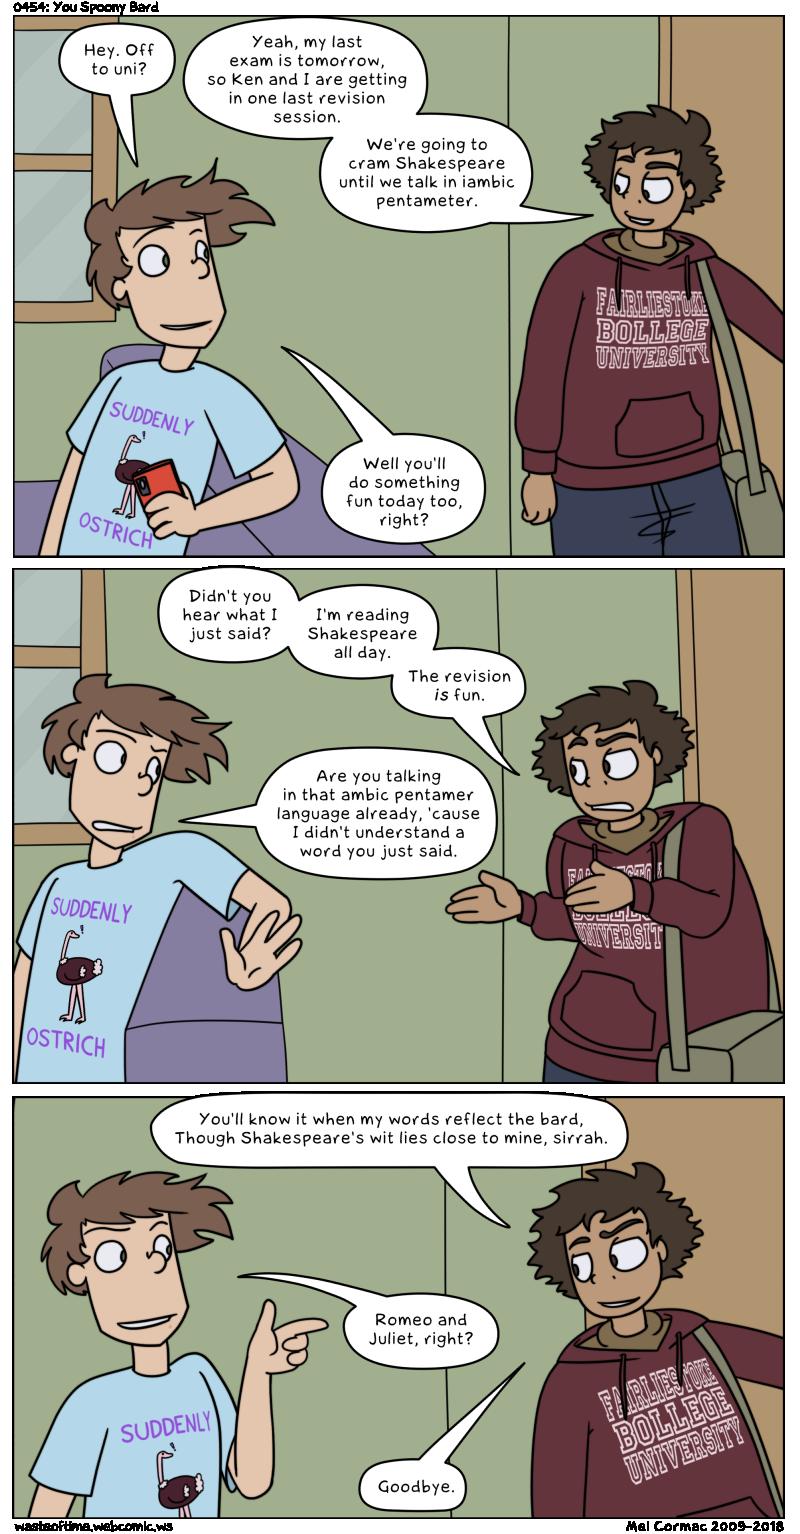 0454: You Spoony Bard